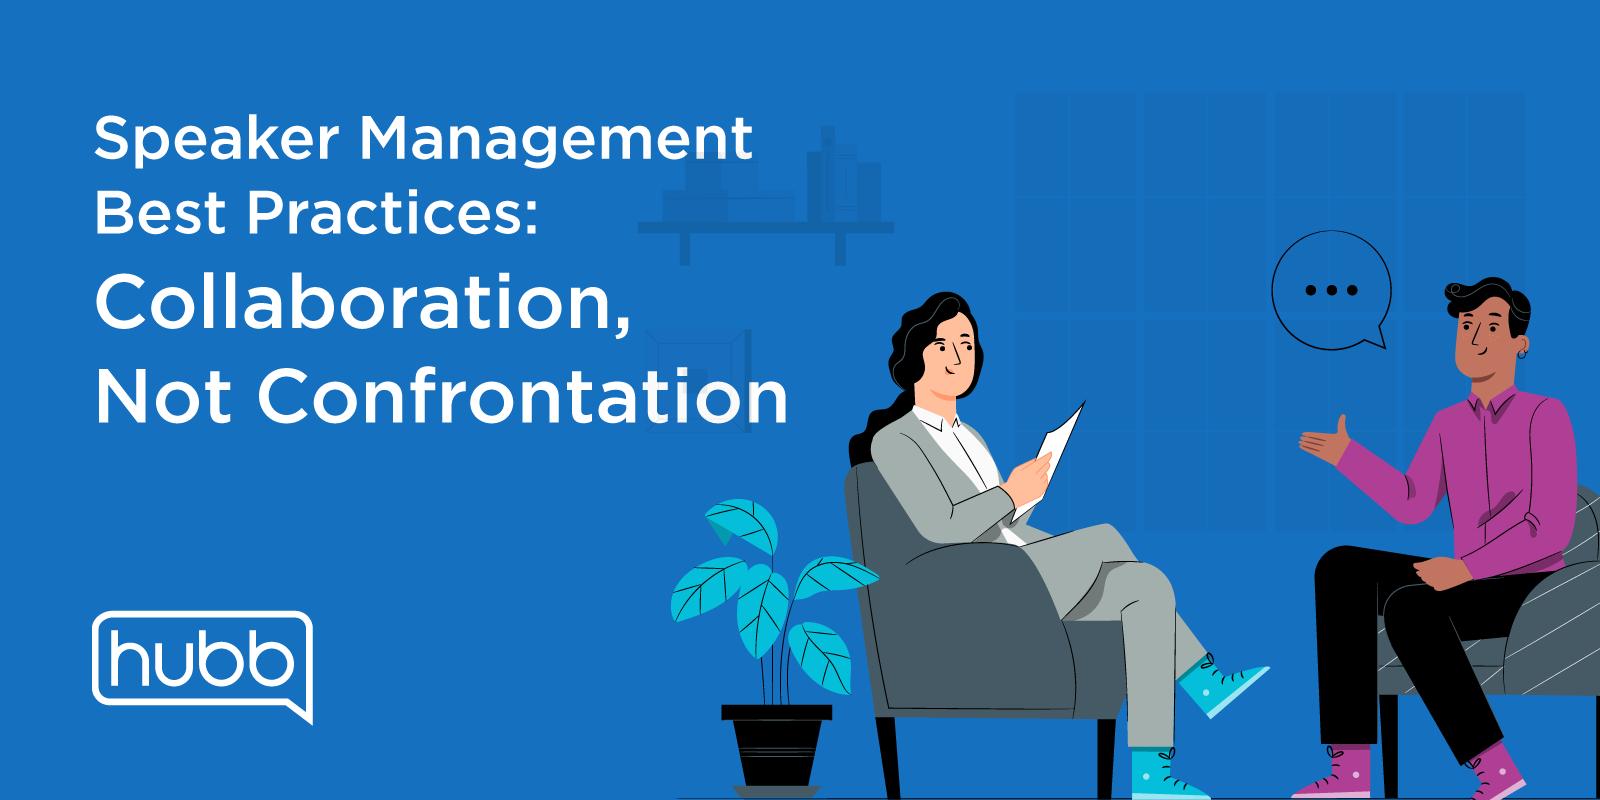 Speaker Management Best Practices: Collaboration, Not Confrontation